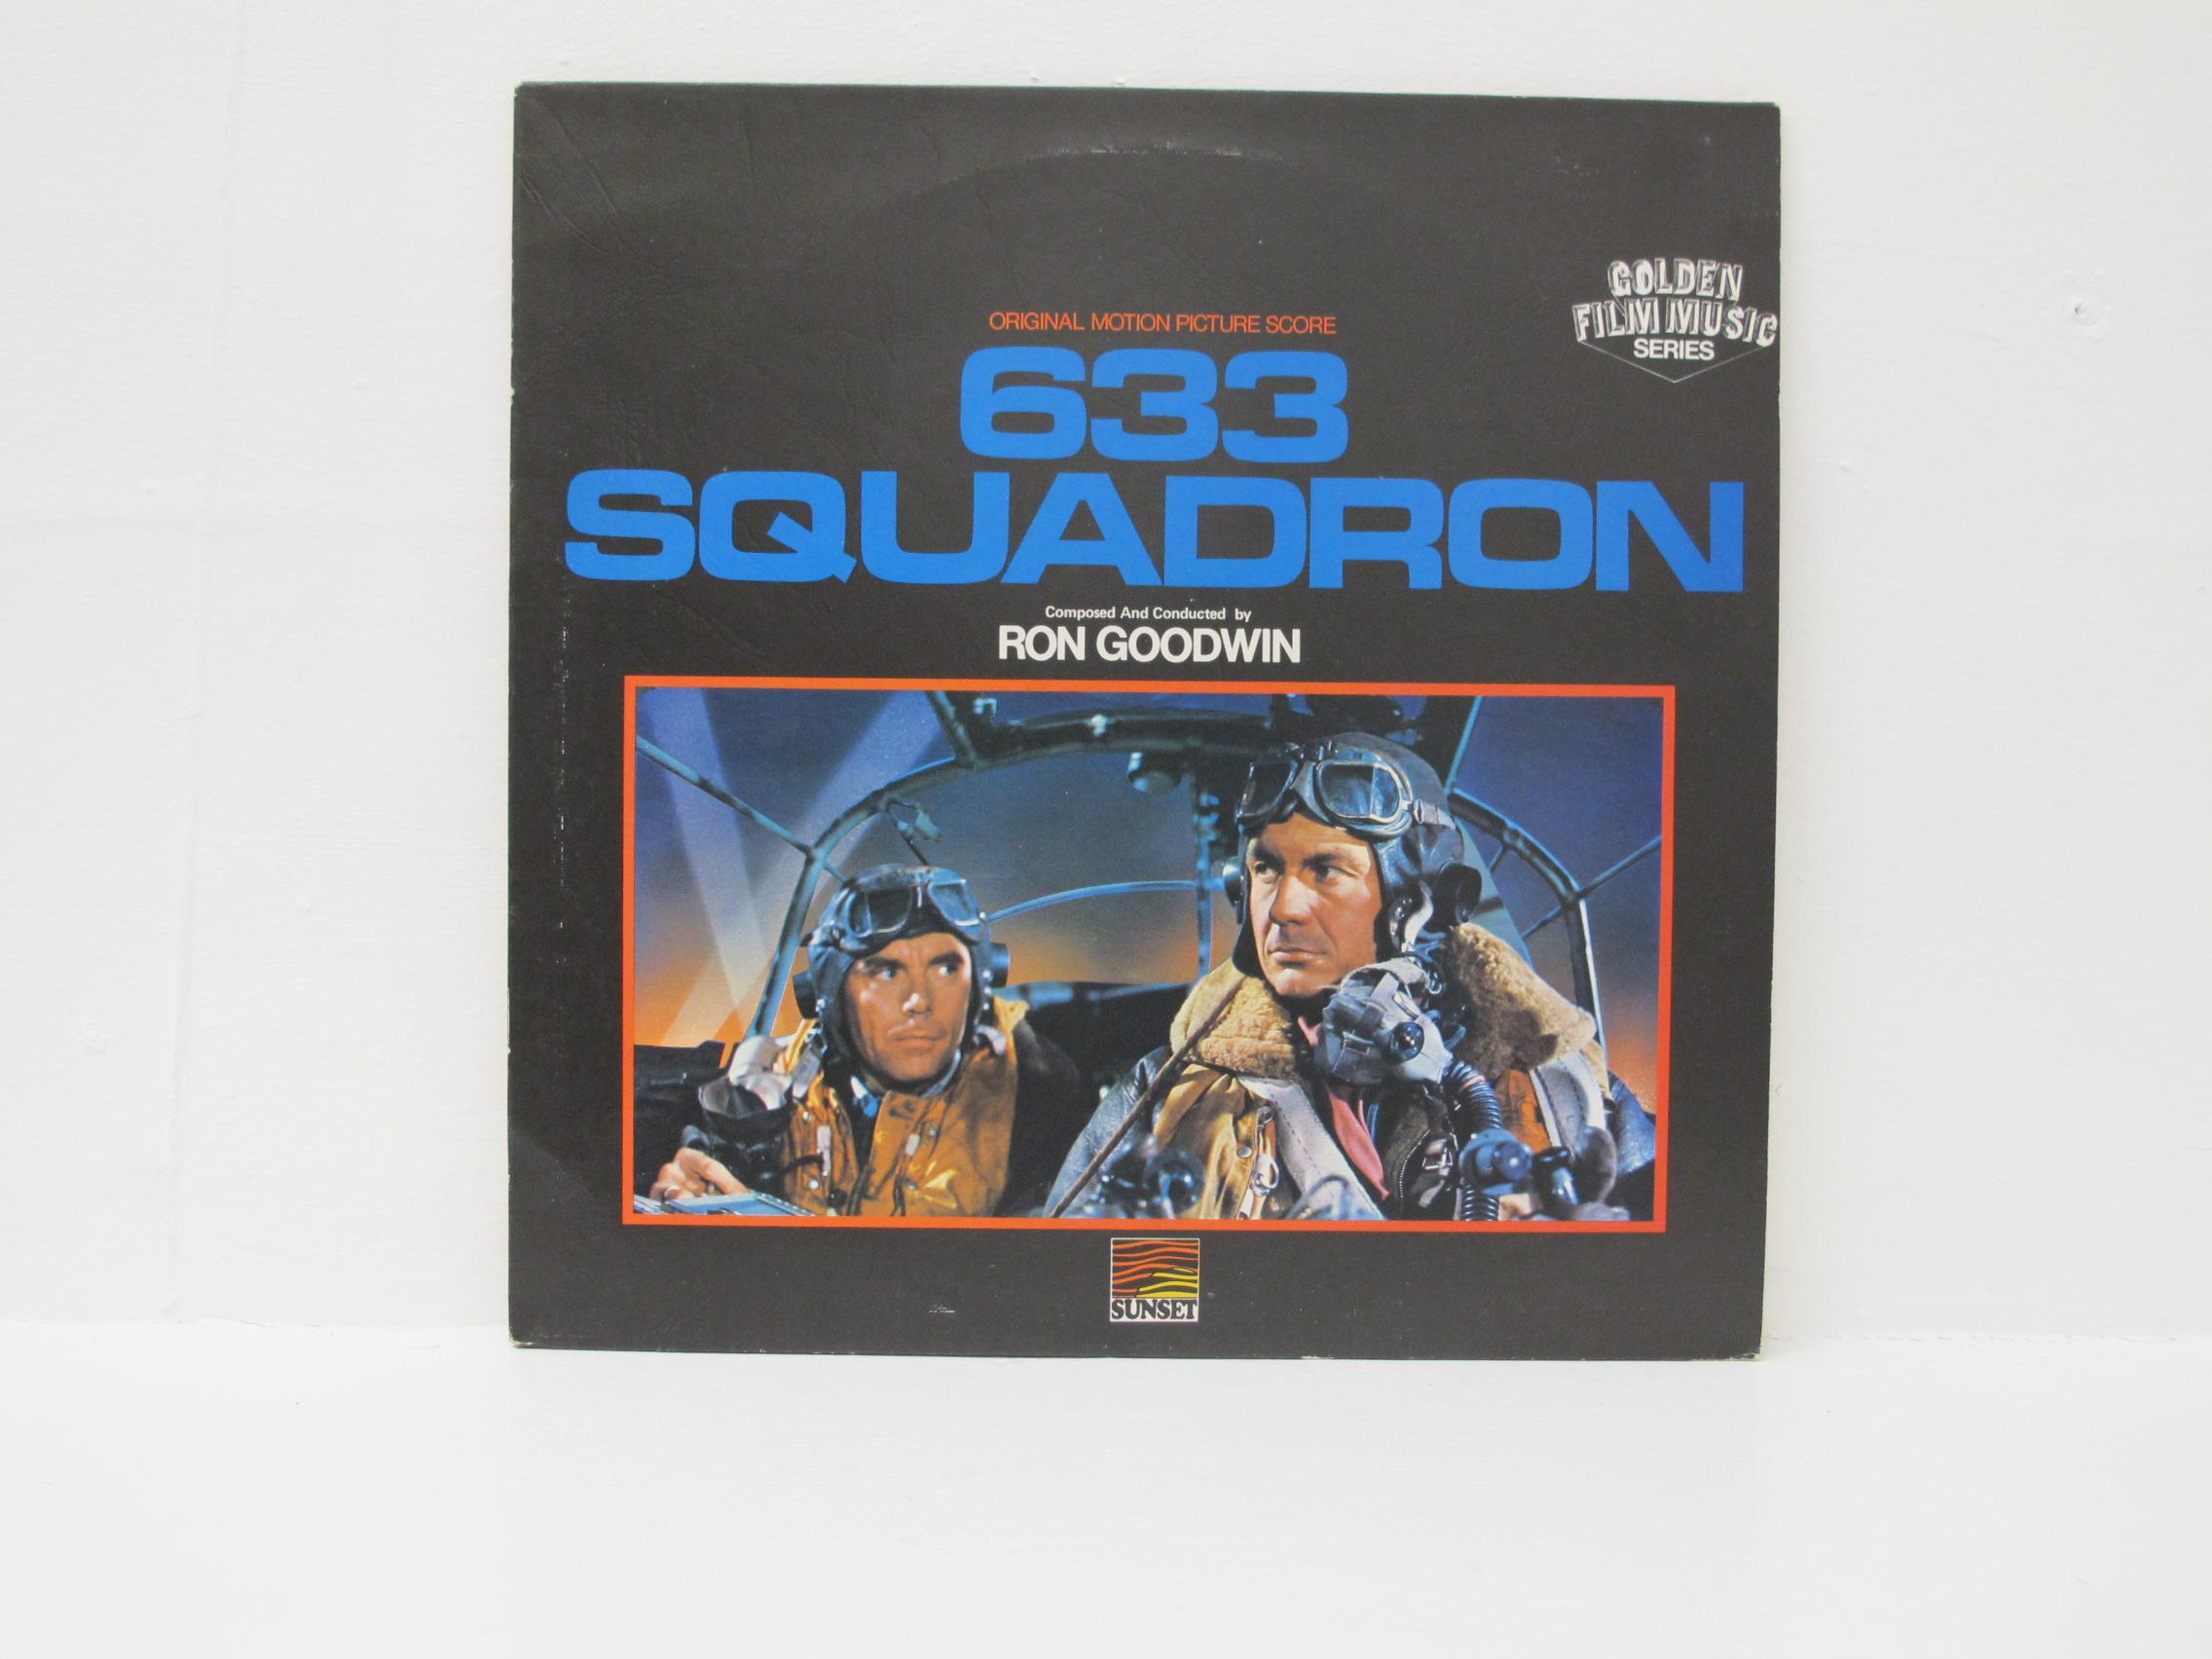 Ron Doodwin - 633 Squadron